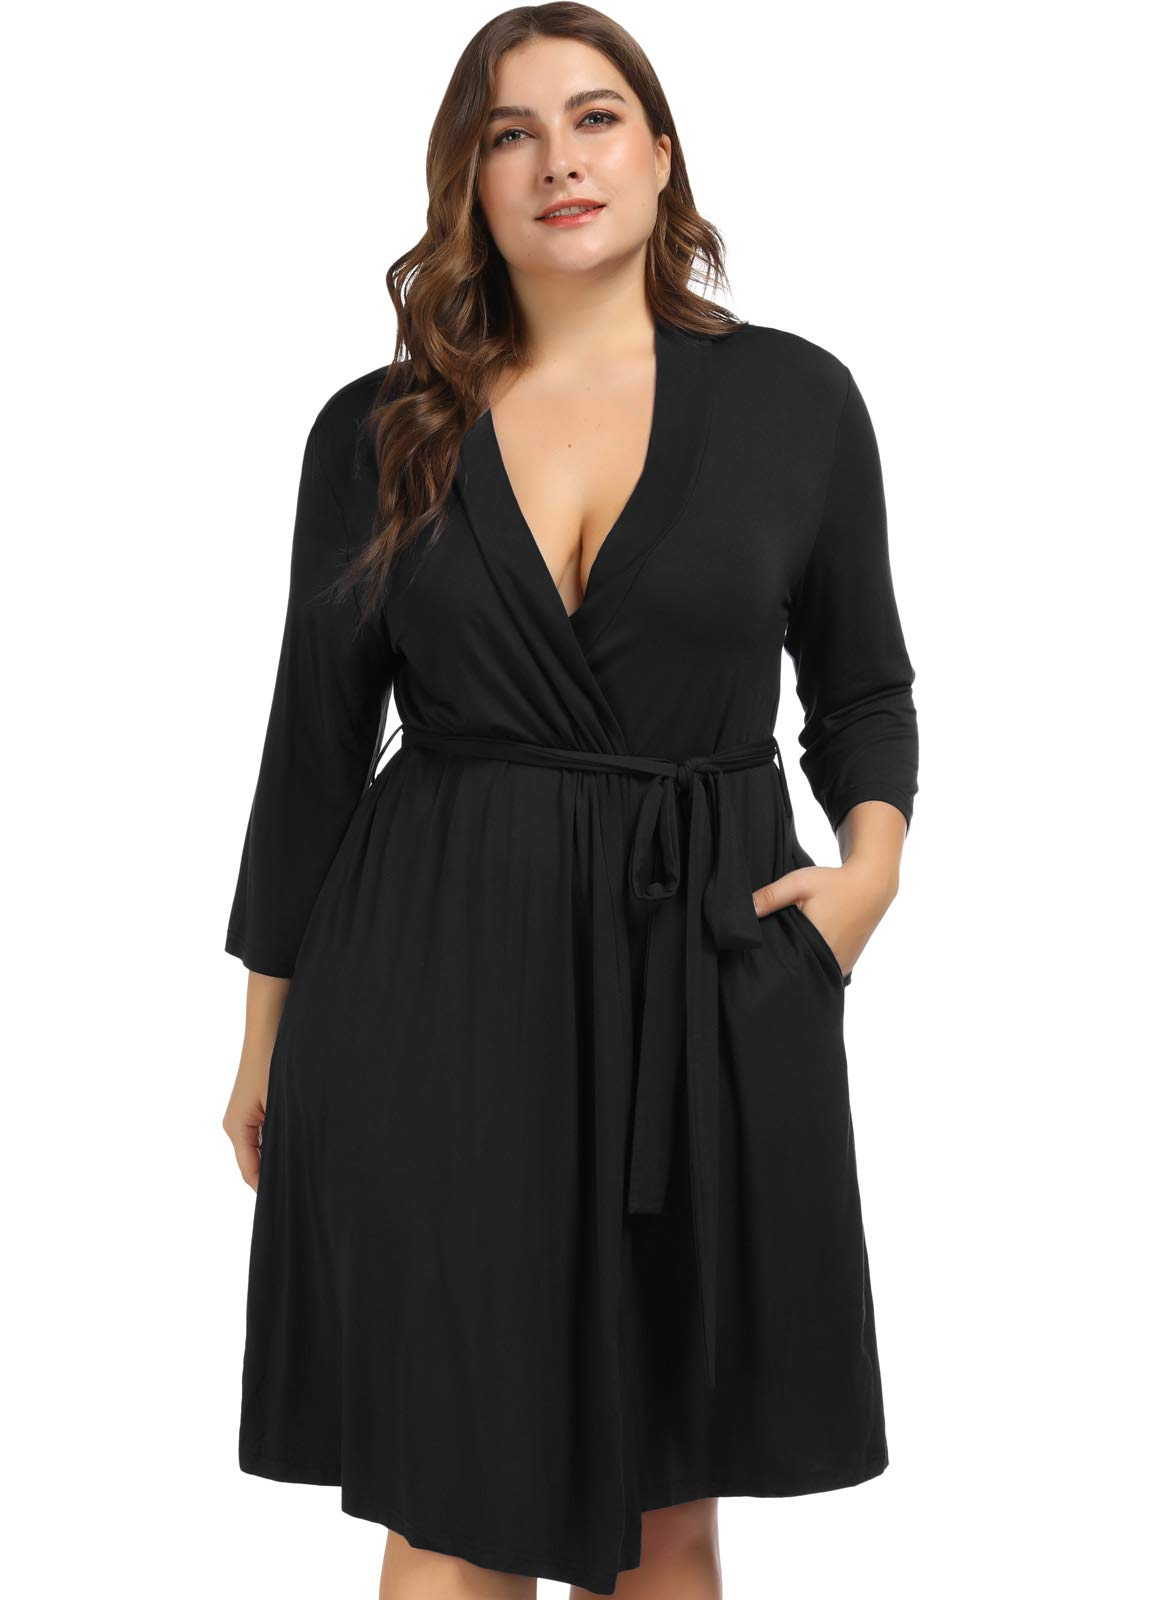 Women's Plus Size Cotton Short Kimono Robes Bathrobe Sleepwear Loungewear